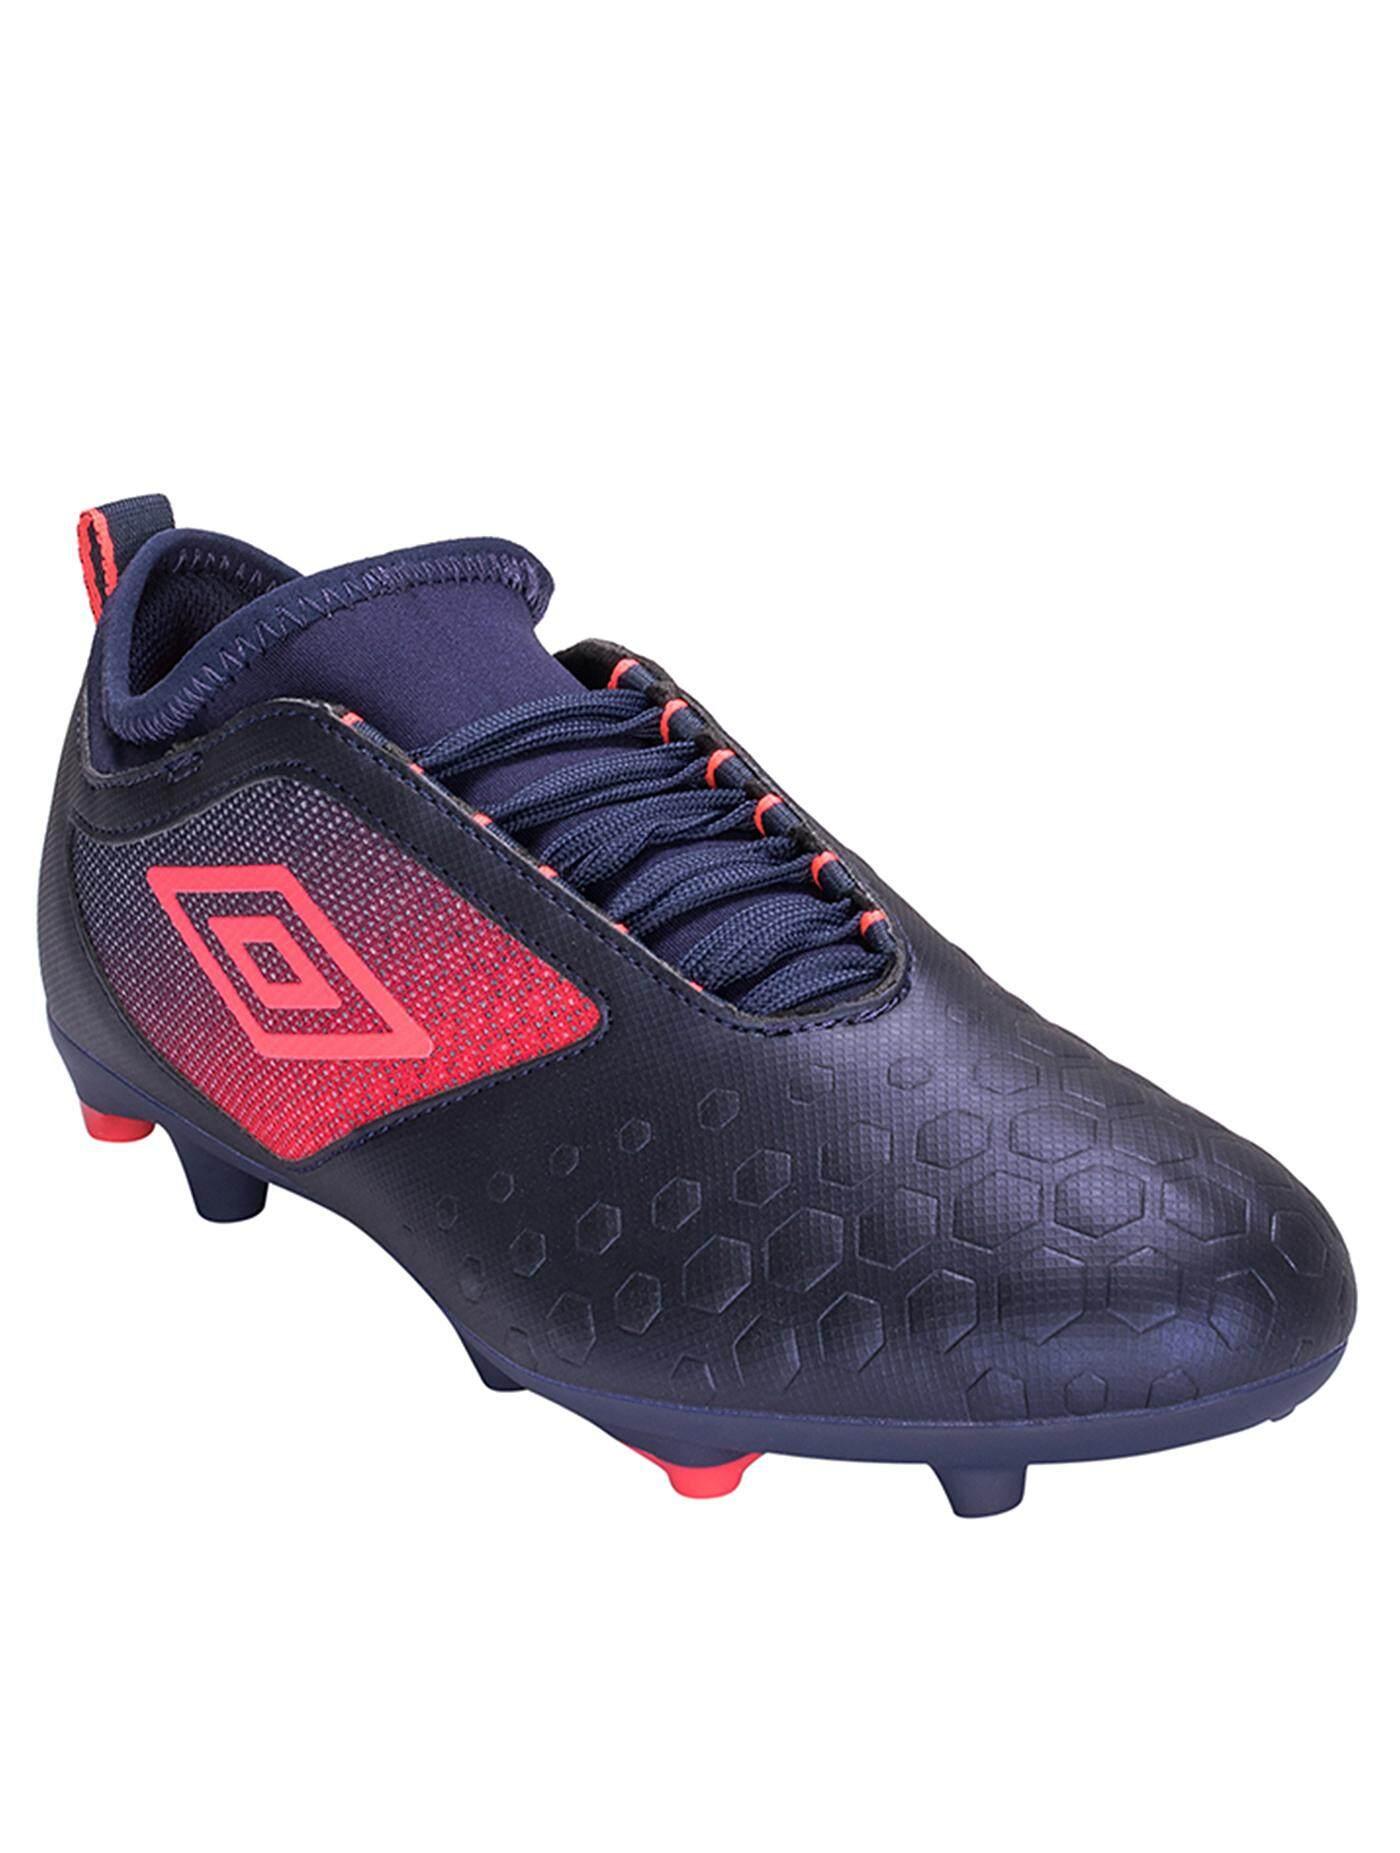 Umbro รองเท้าฟุตบอลผู้ชาย รุ่น Ux Accuro Ii Premier Hg 81317u-Fng ไซส์ Us8 สีม่วง By Lnwitem